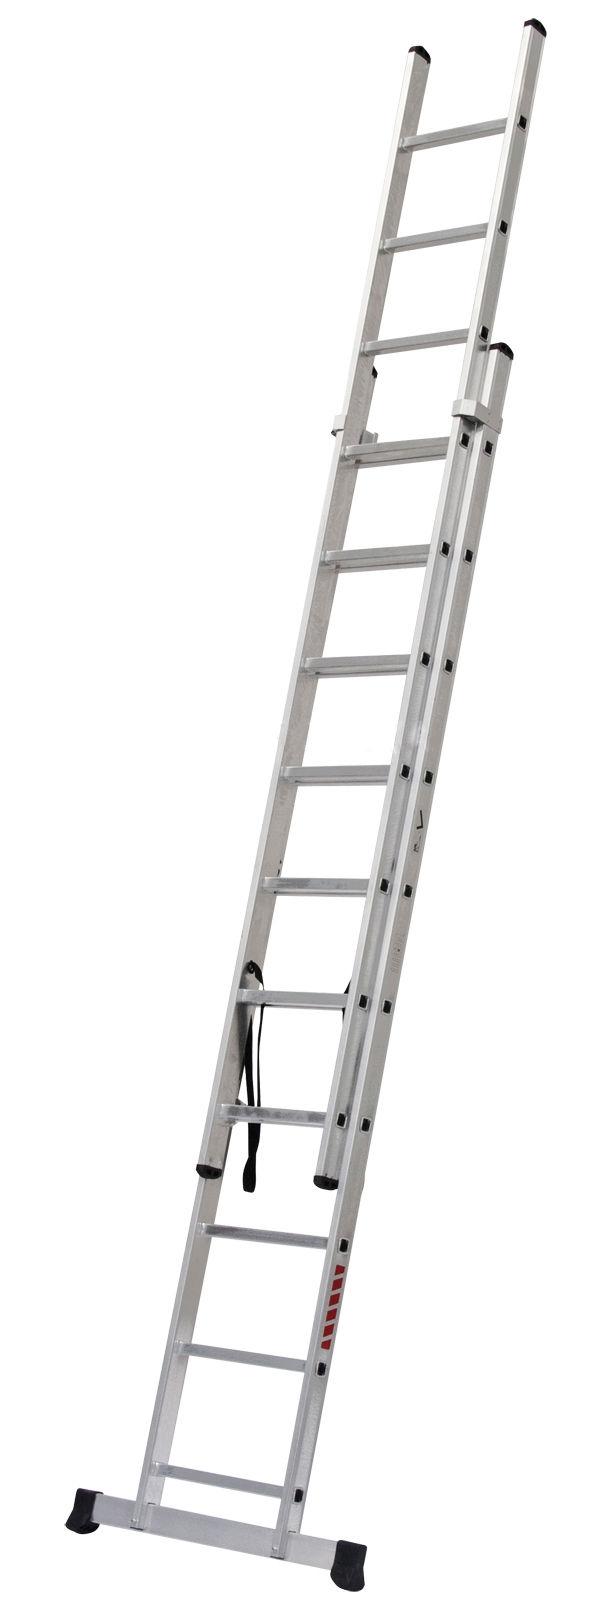 escalera industrial combi tramos x peldaos pt profertop